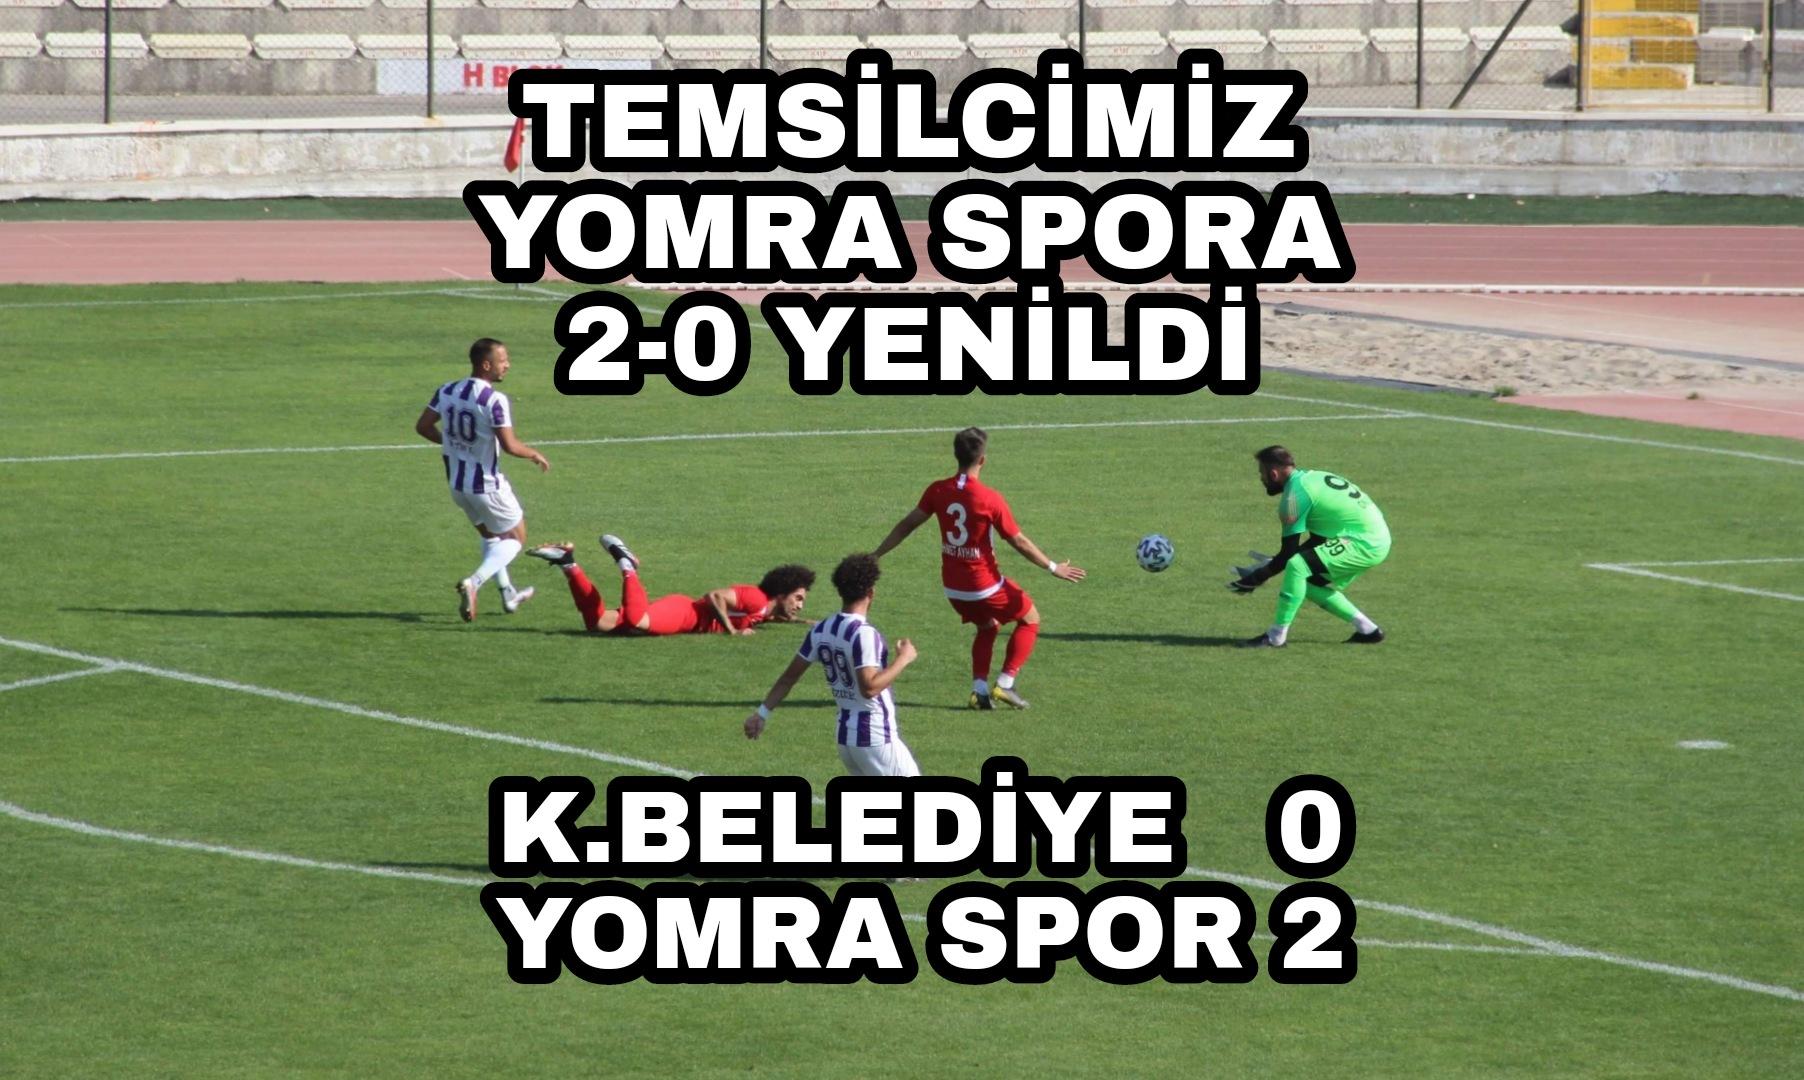 TFF 3. Lig: Karaman Belediyespor: 0 - Yomraspor: 2